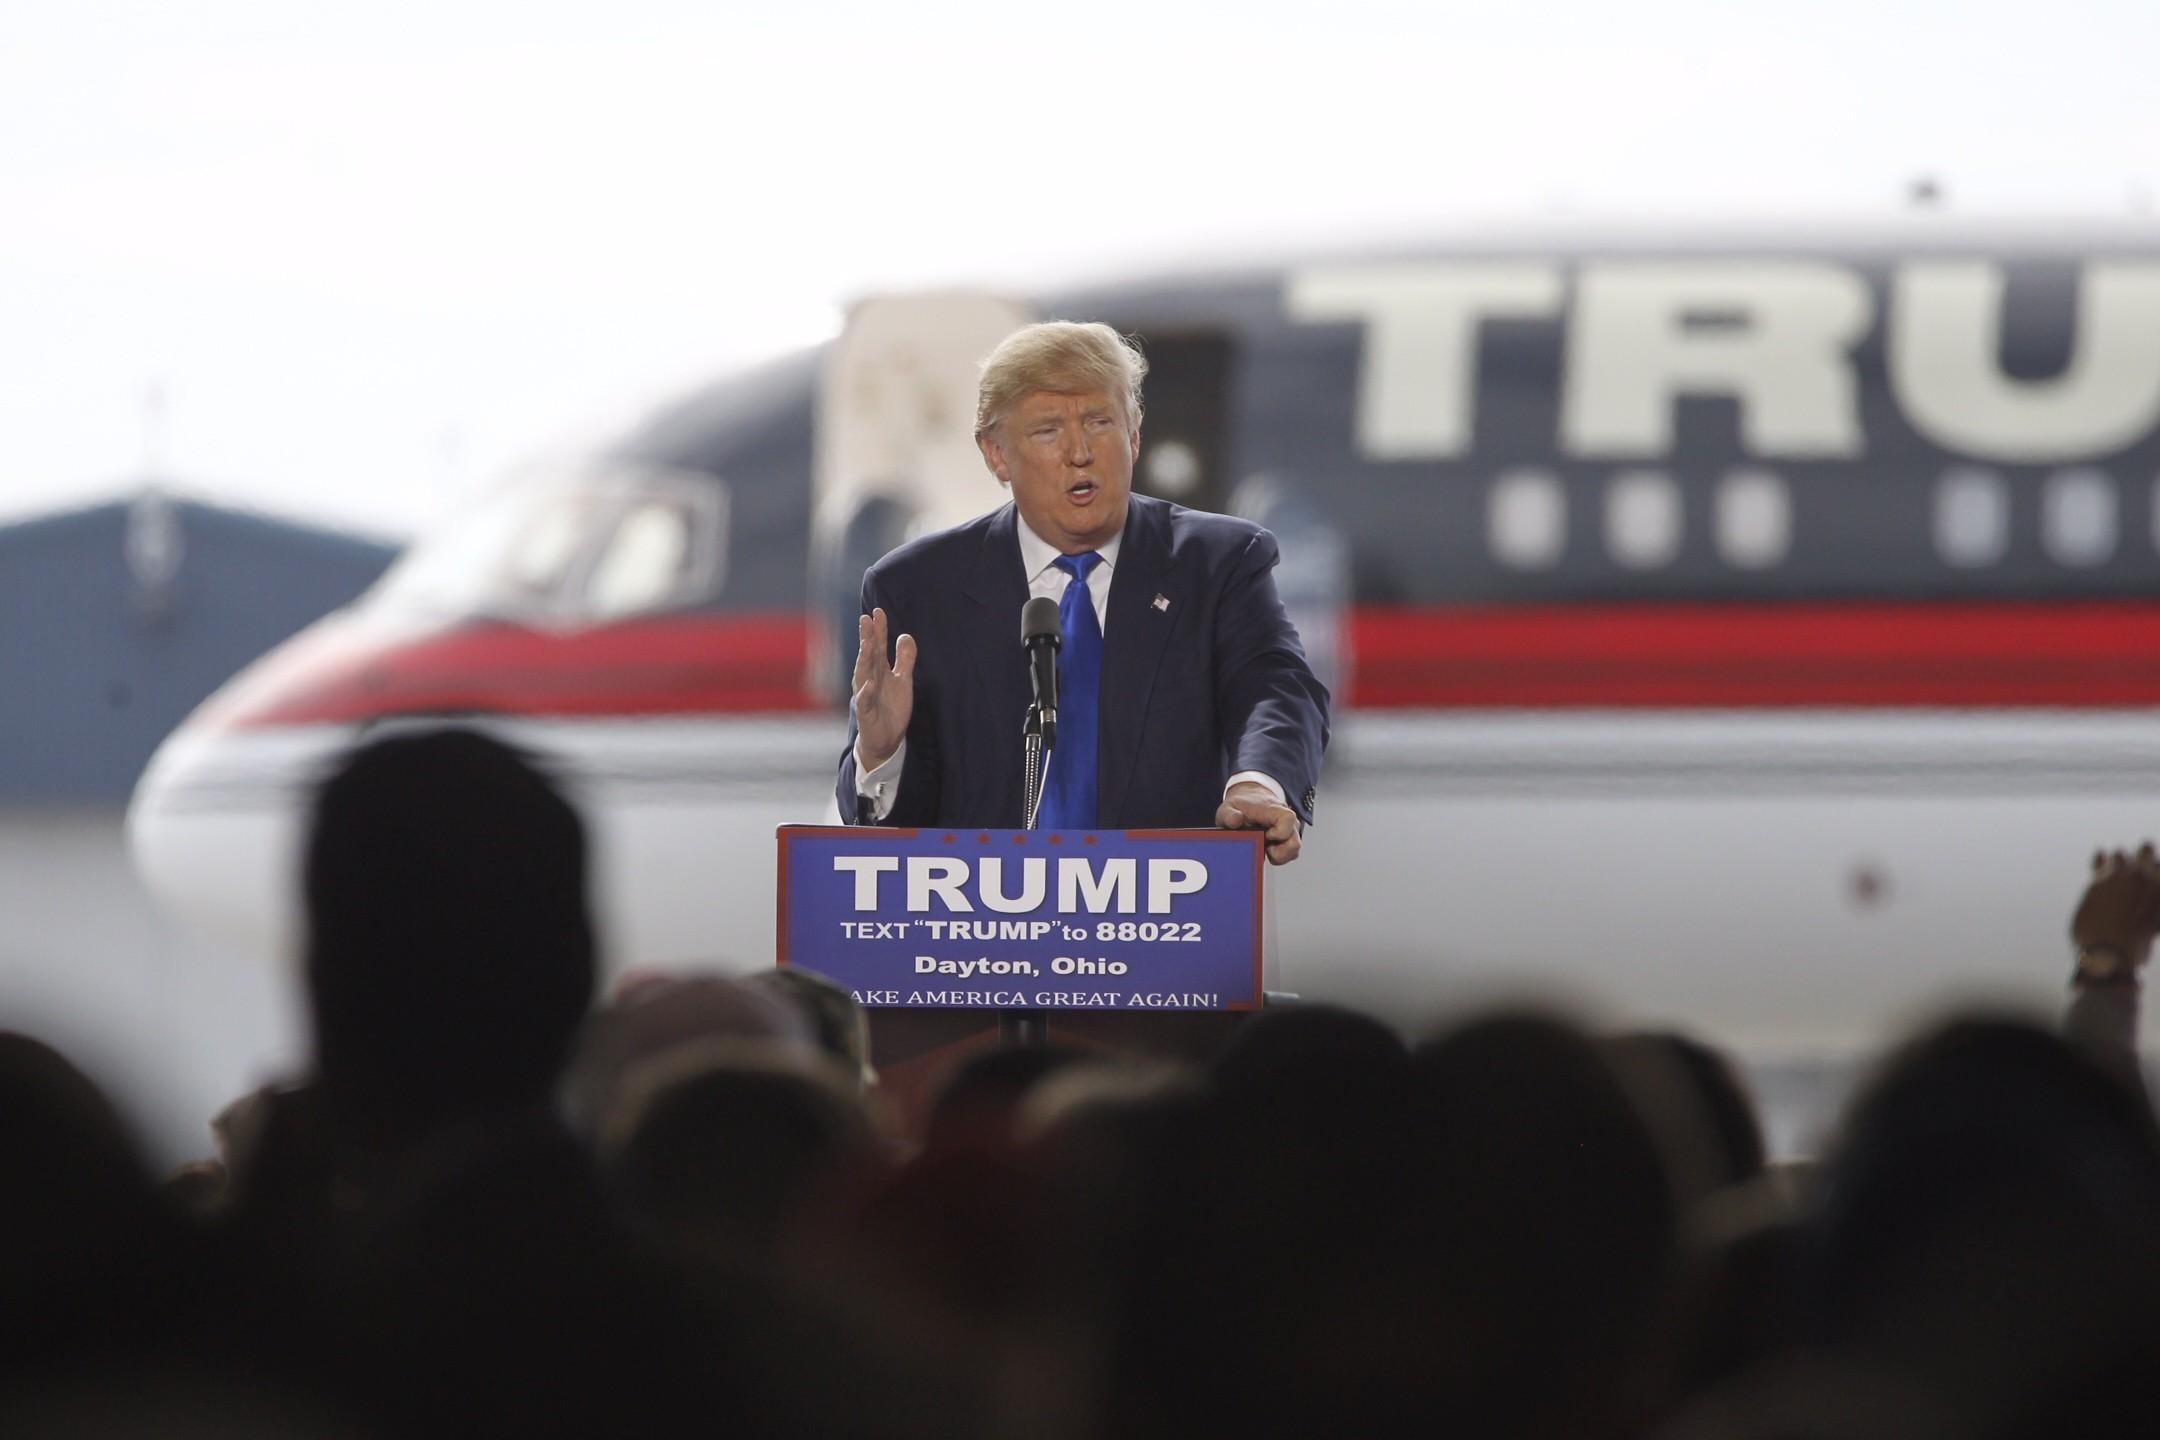 Donald Trump HD Wallpaper Background Image 2160x1440